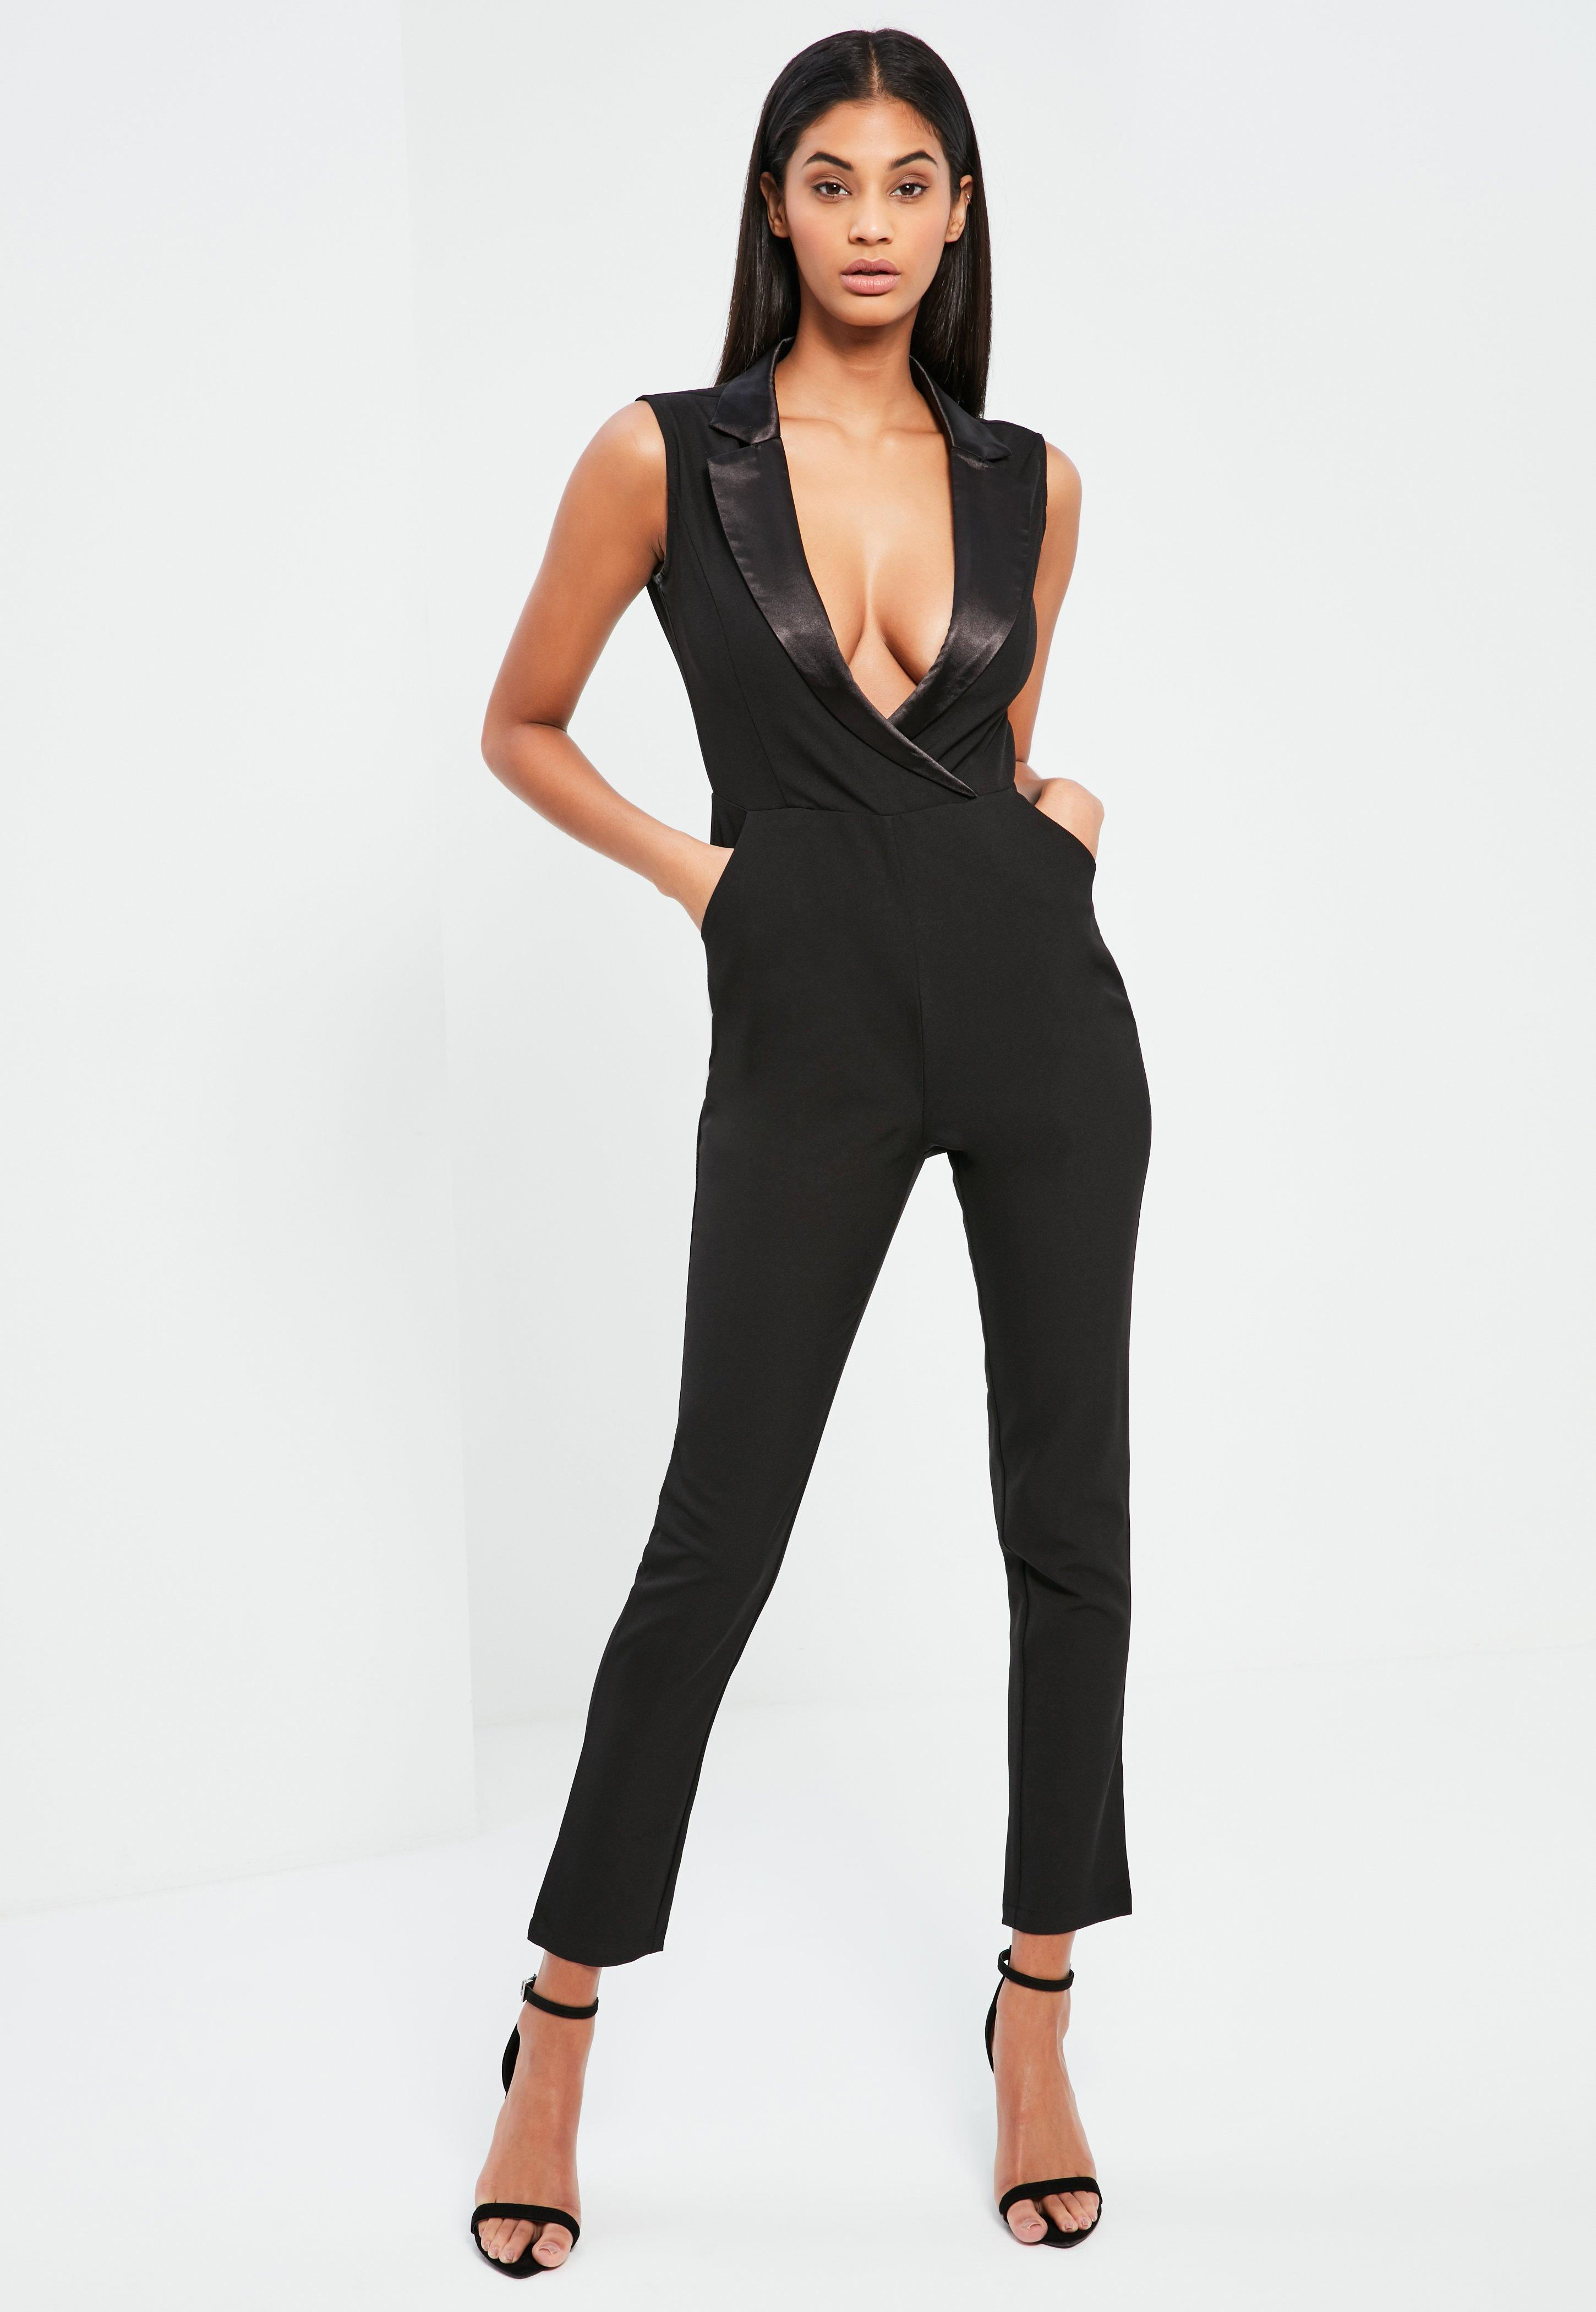 aa9b3393cea Lyst - Missguided Black Satin Lapel Sleeveless Tux Jumpsuit in Black